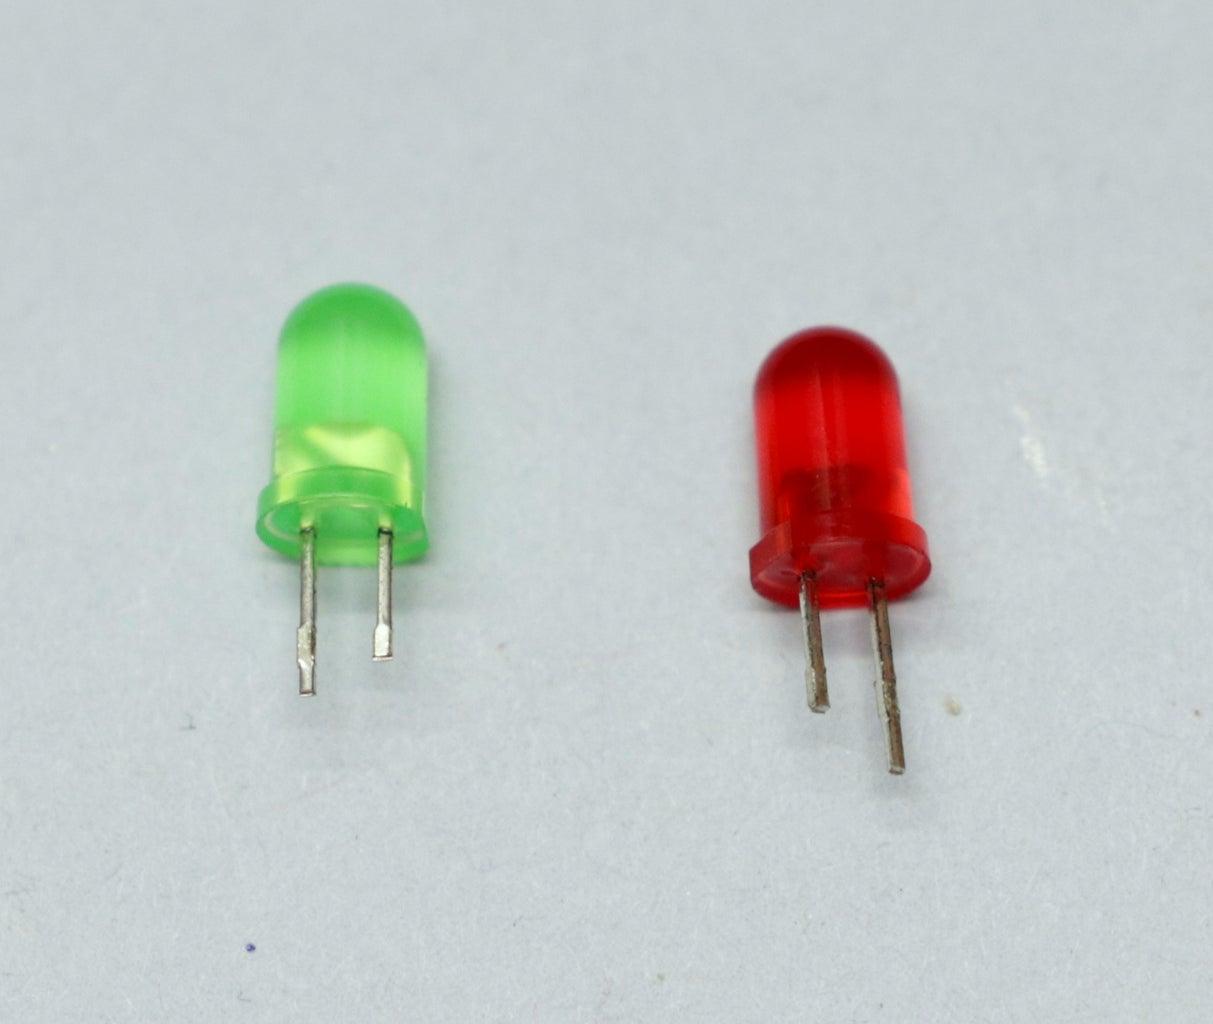 Solder the Charging Status LEDs